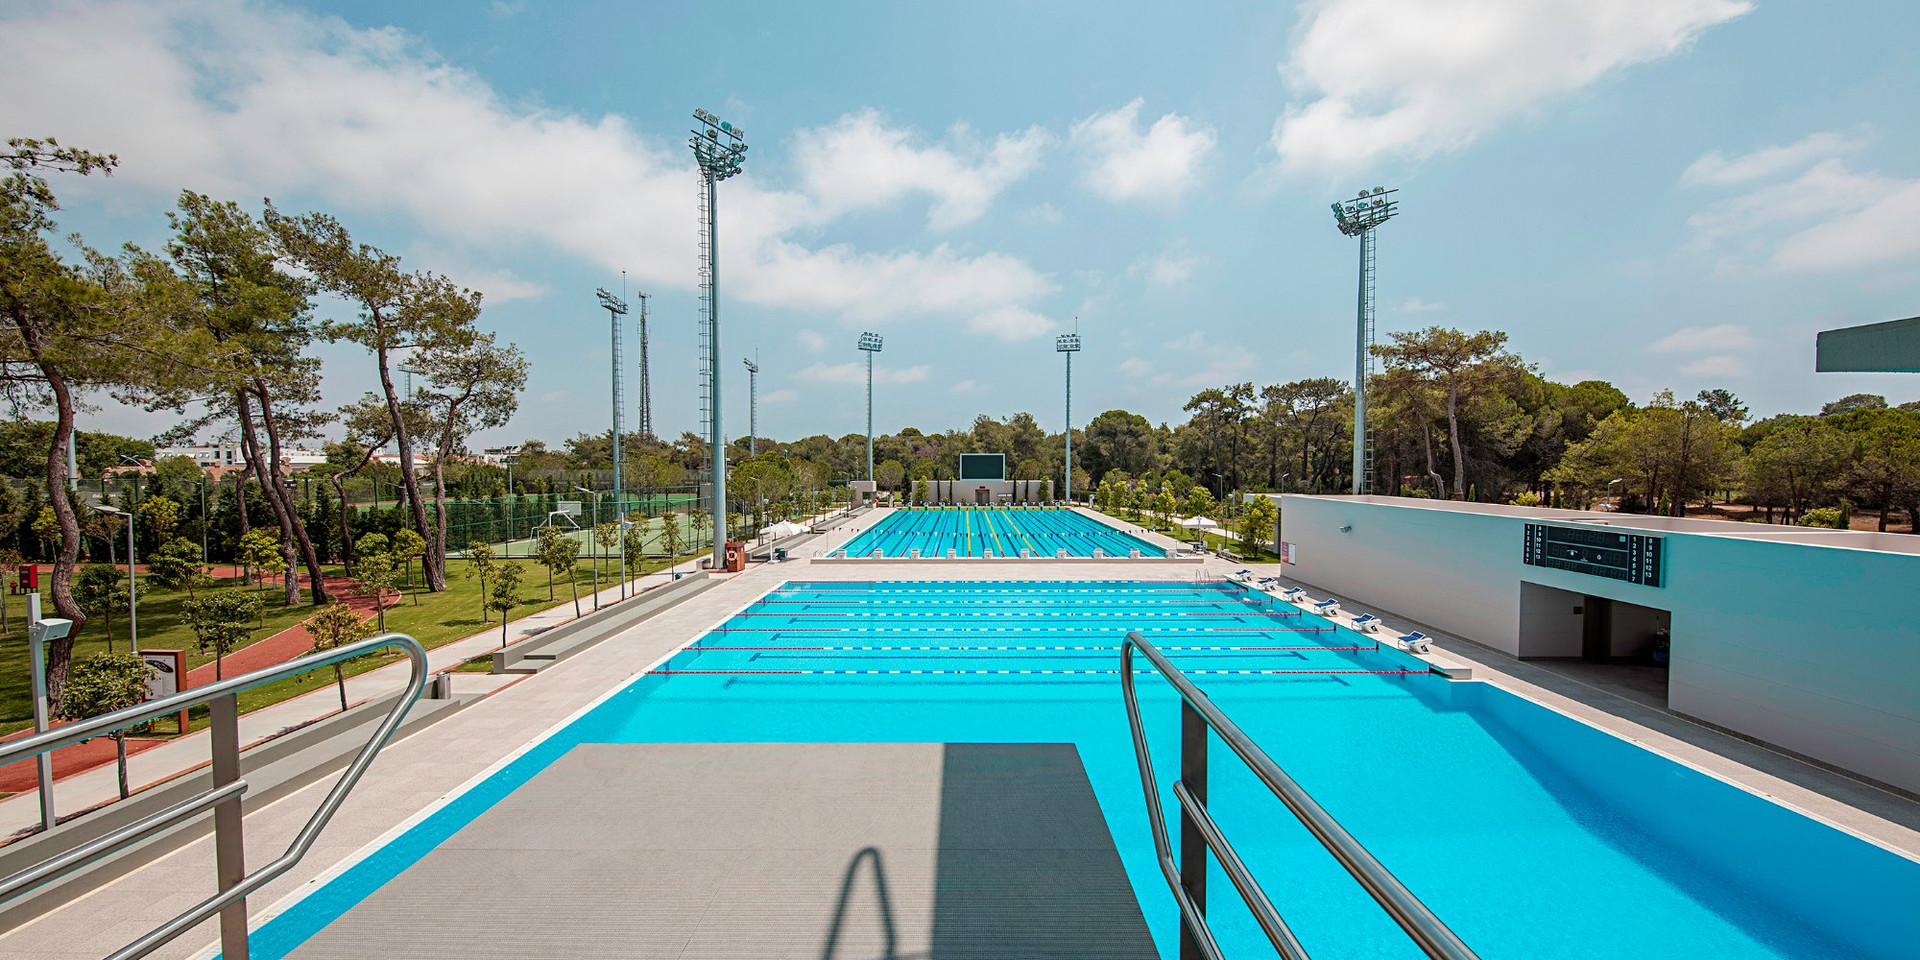 aquatic-sports-facilities.jpg